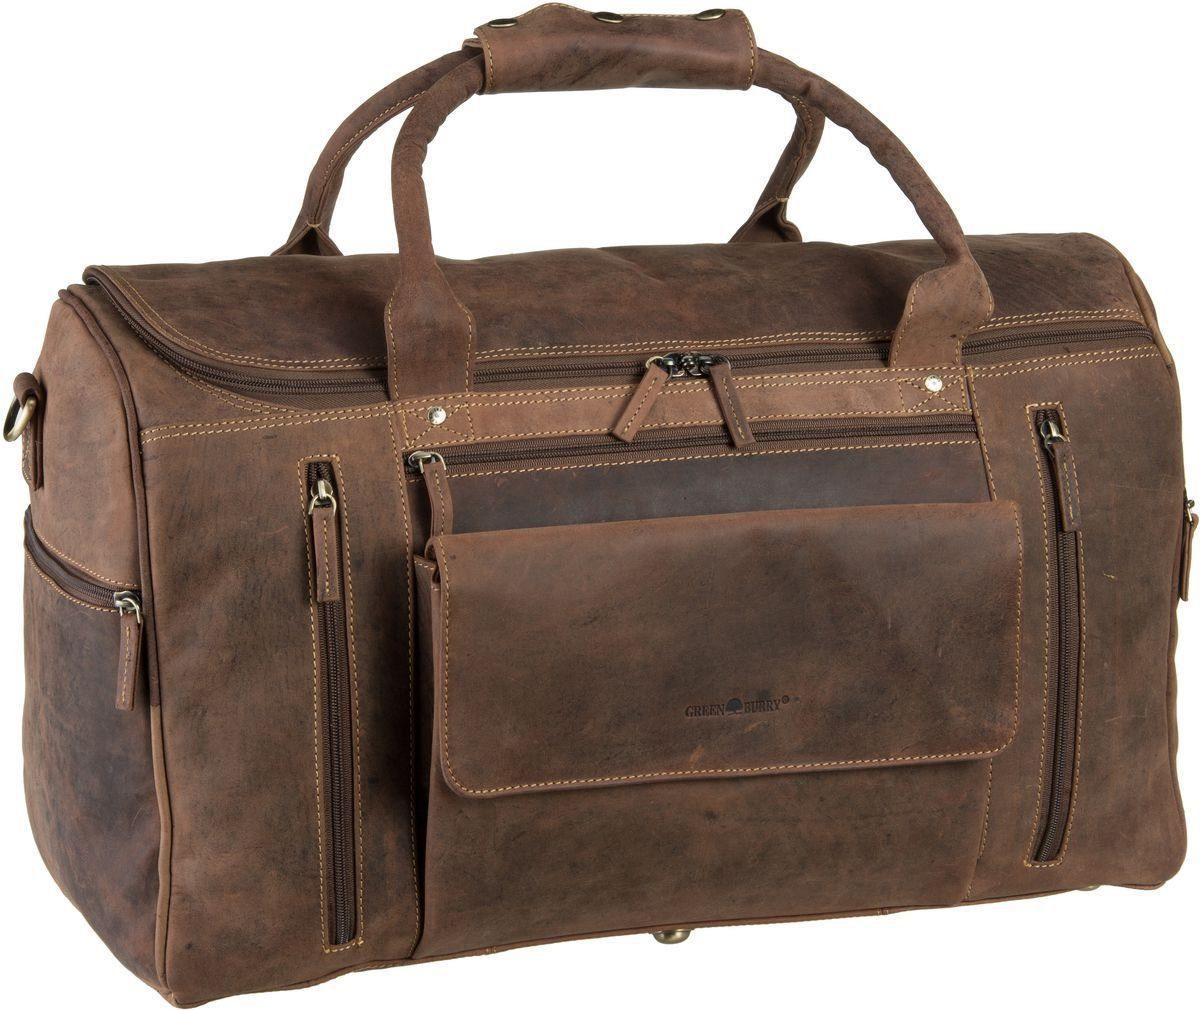 Greenburry Vintage Traveller